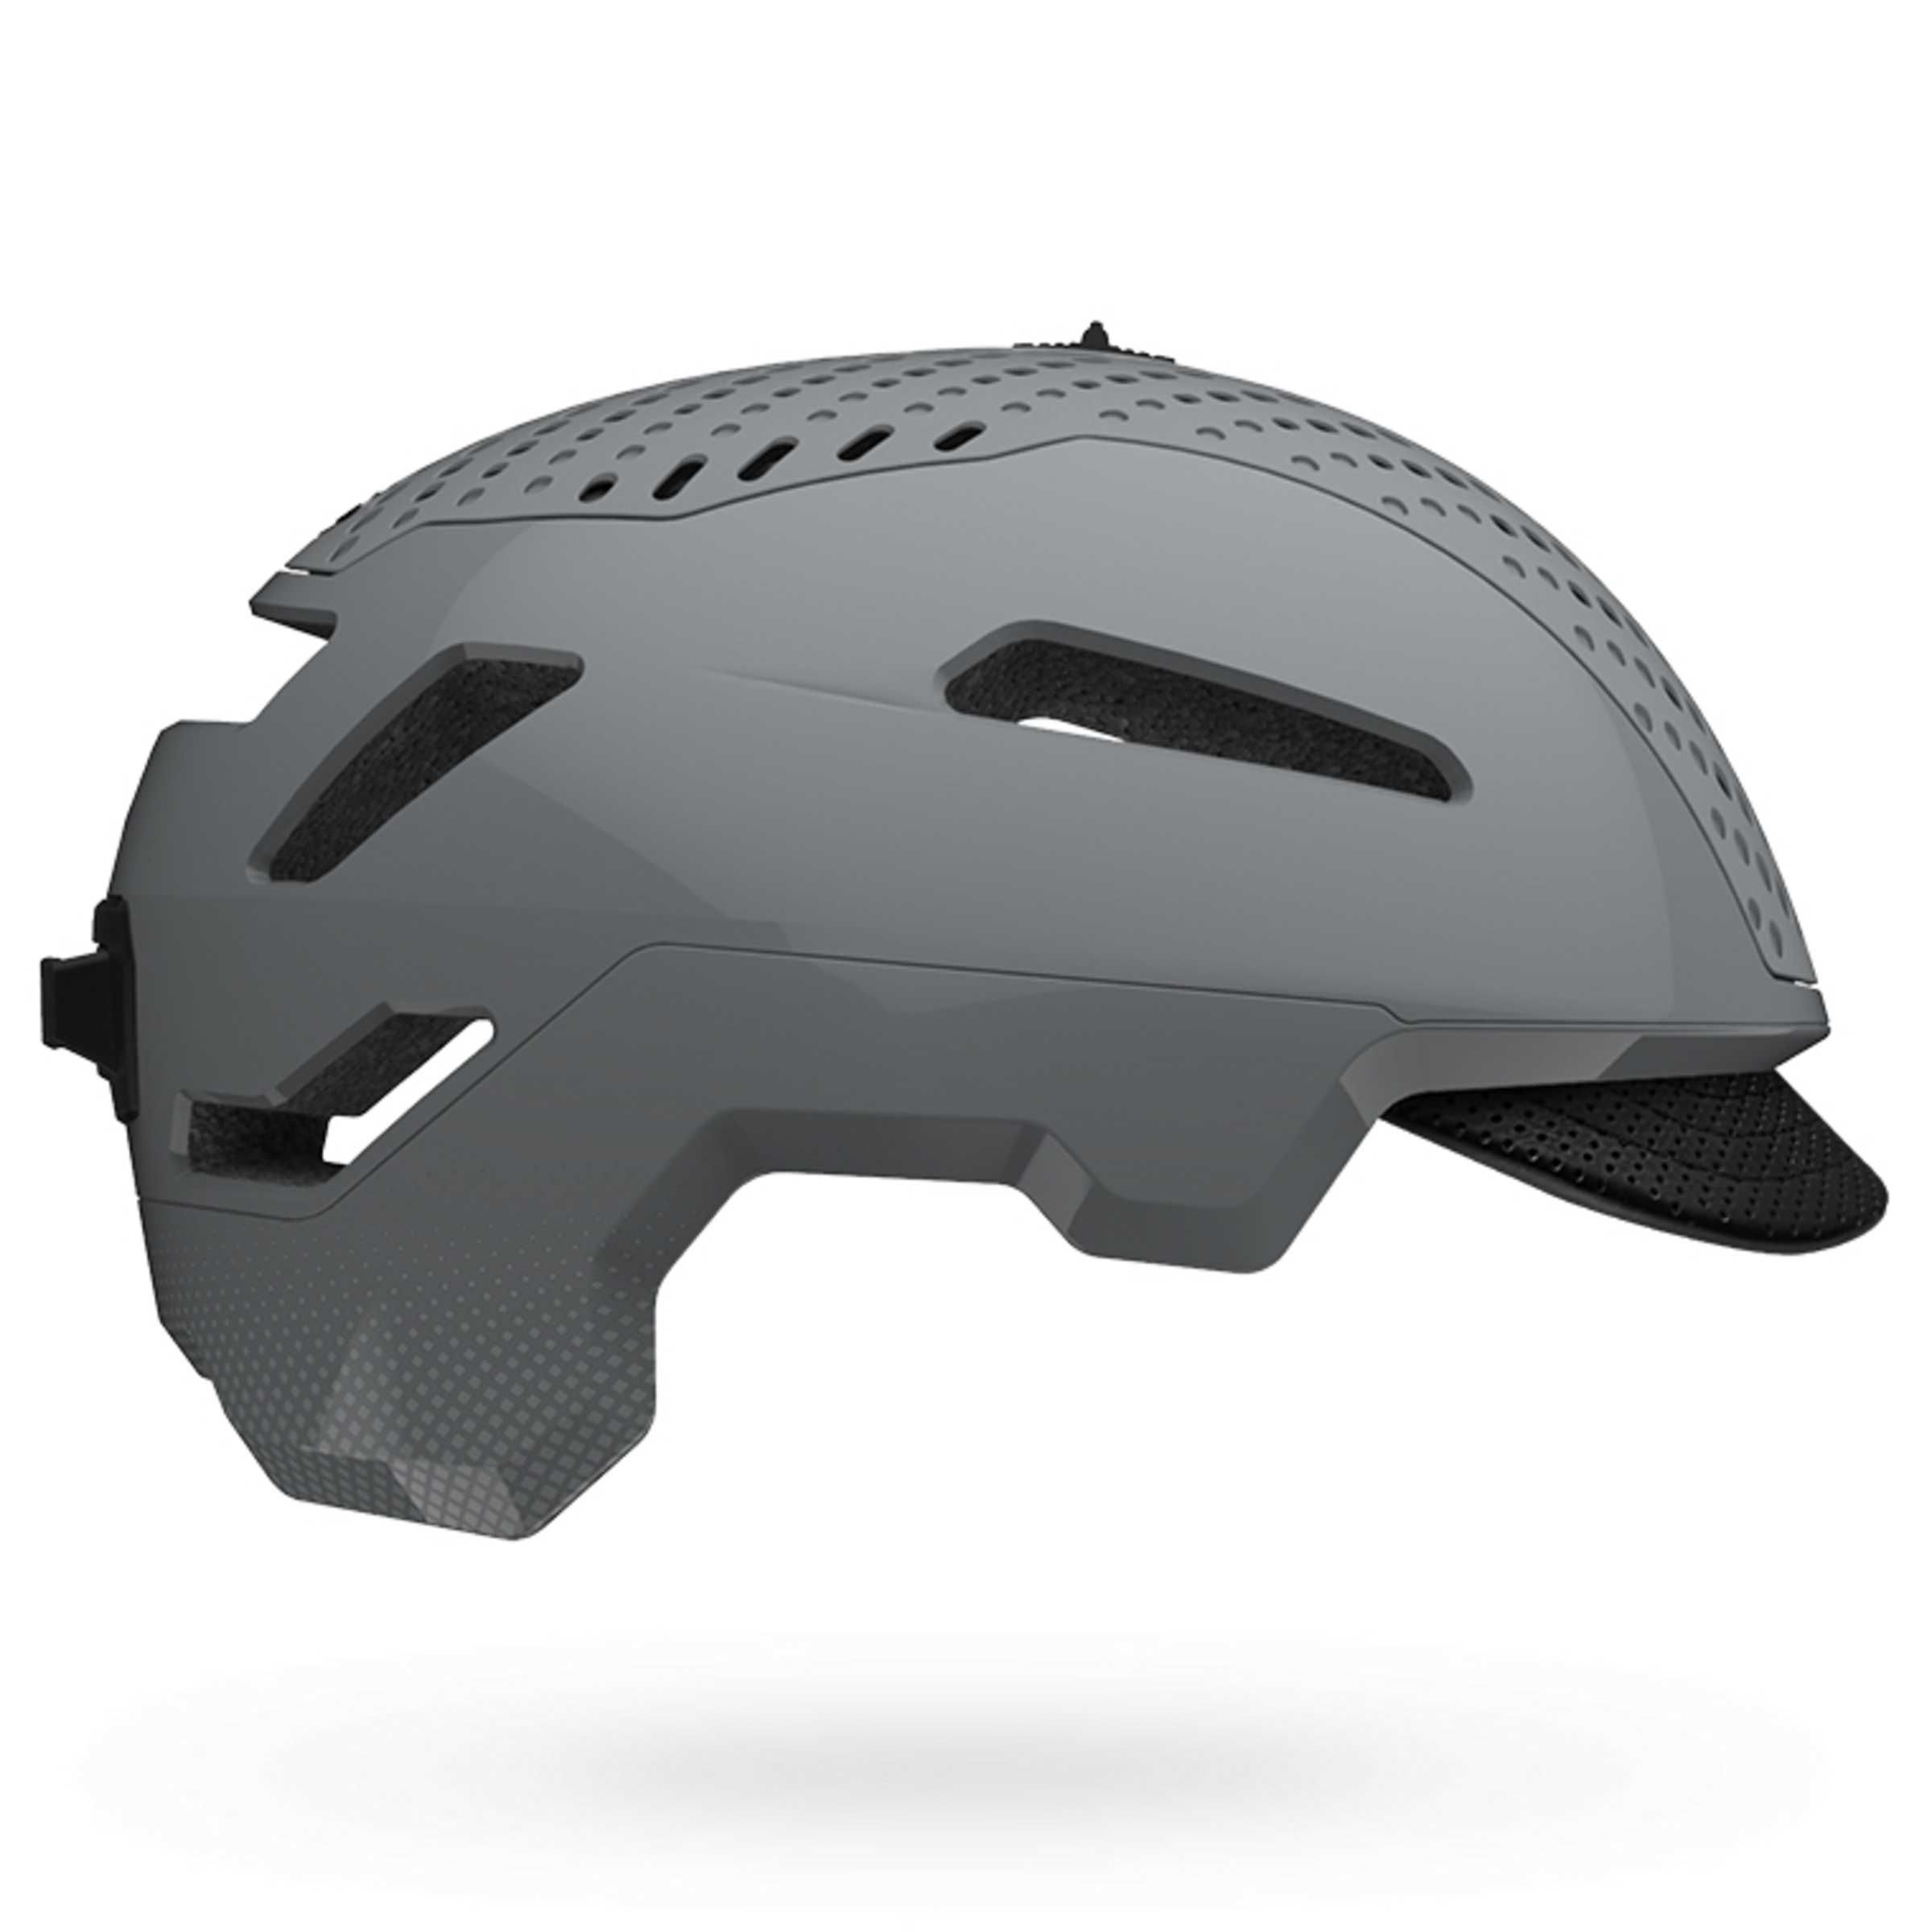 Bell's Annex helmet targets the demanding commuter | ACQUIRE